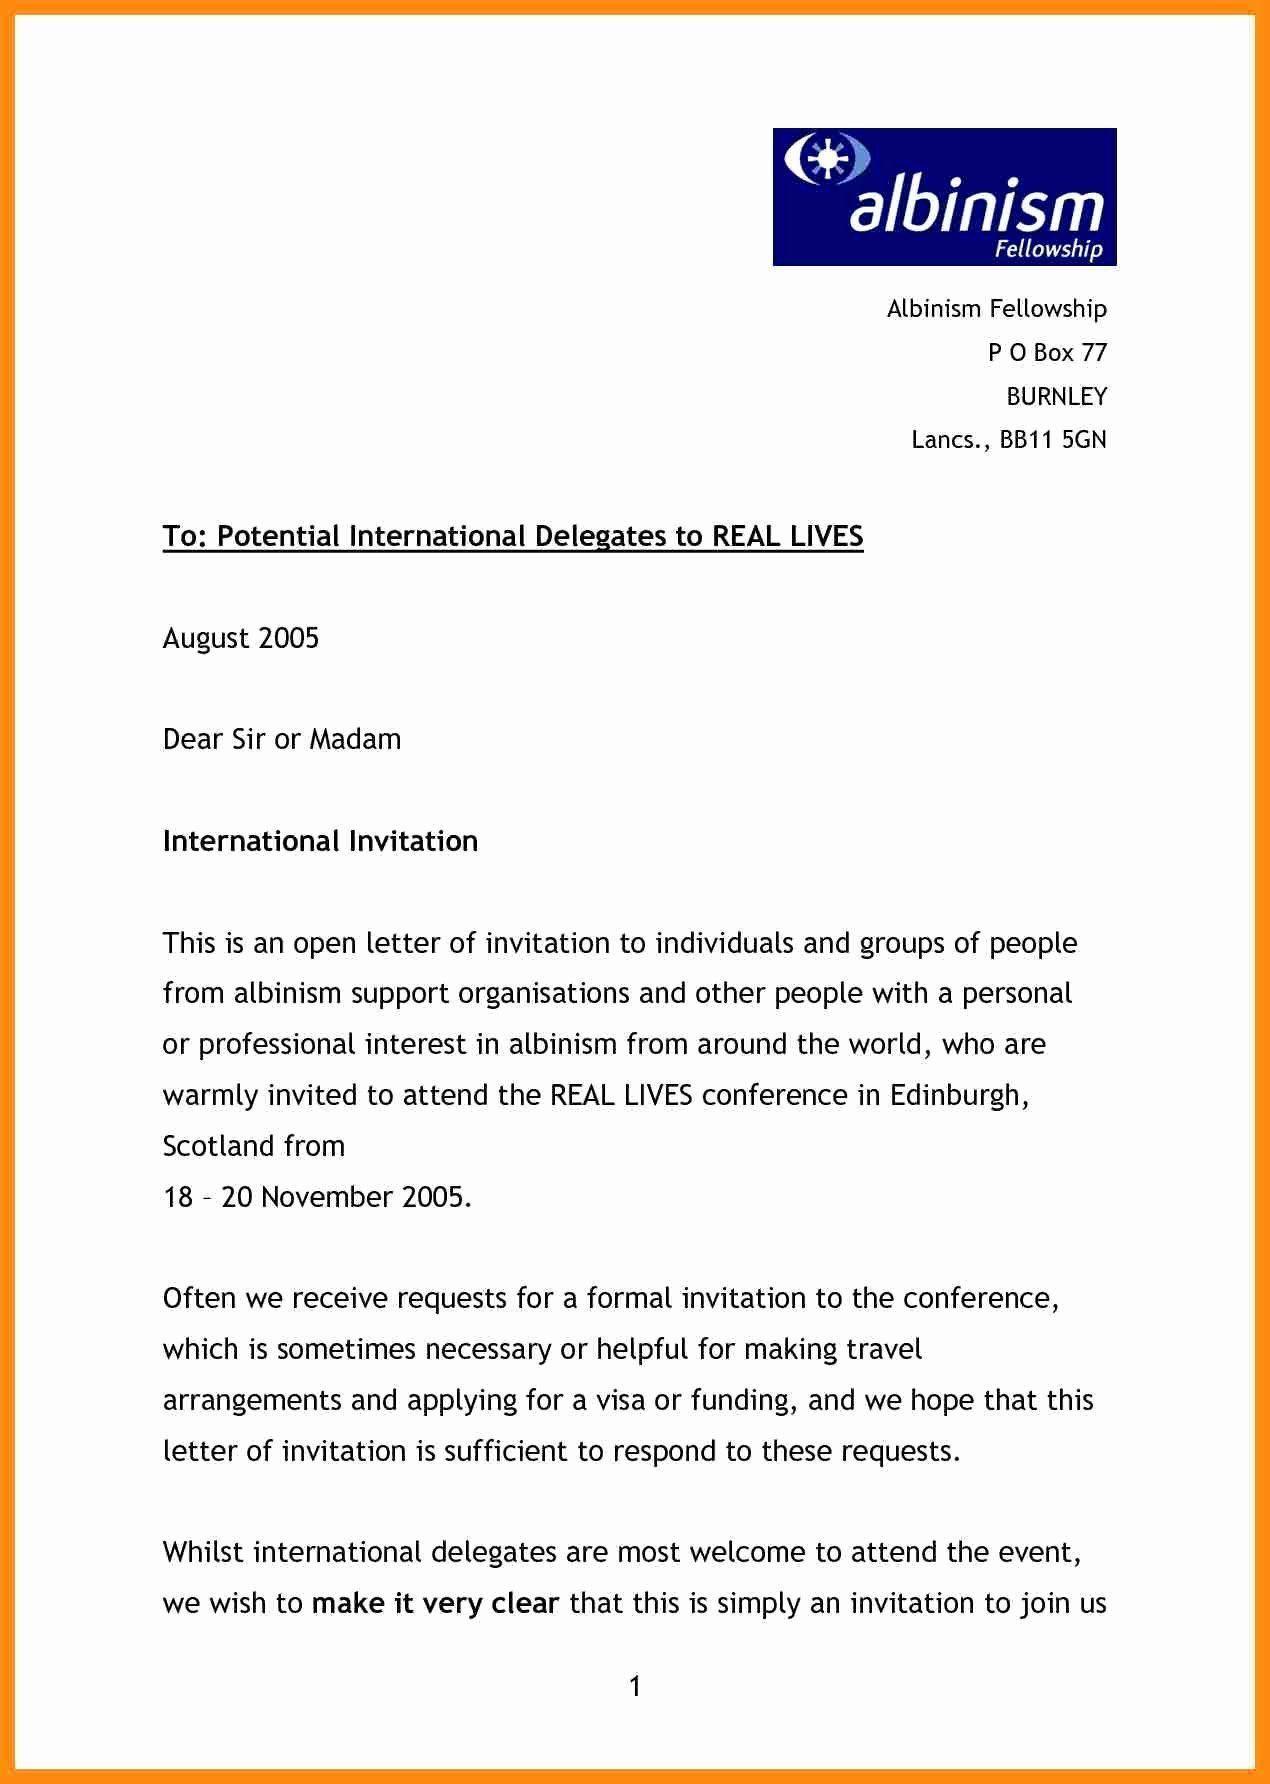 Event Invitation Email Template New Event Invitation Email Sample Filename Email Email Event In 2020 Event Invitation Formal Invitation Business Events Invitation